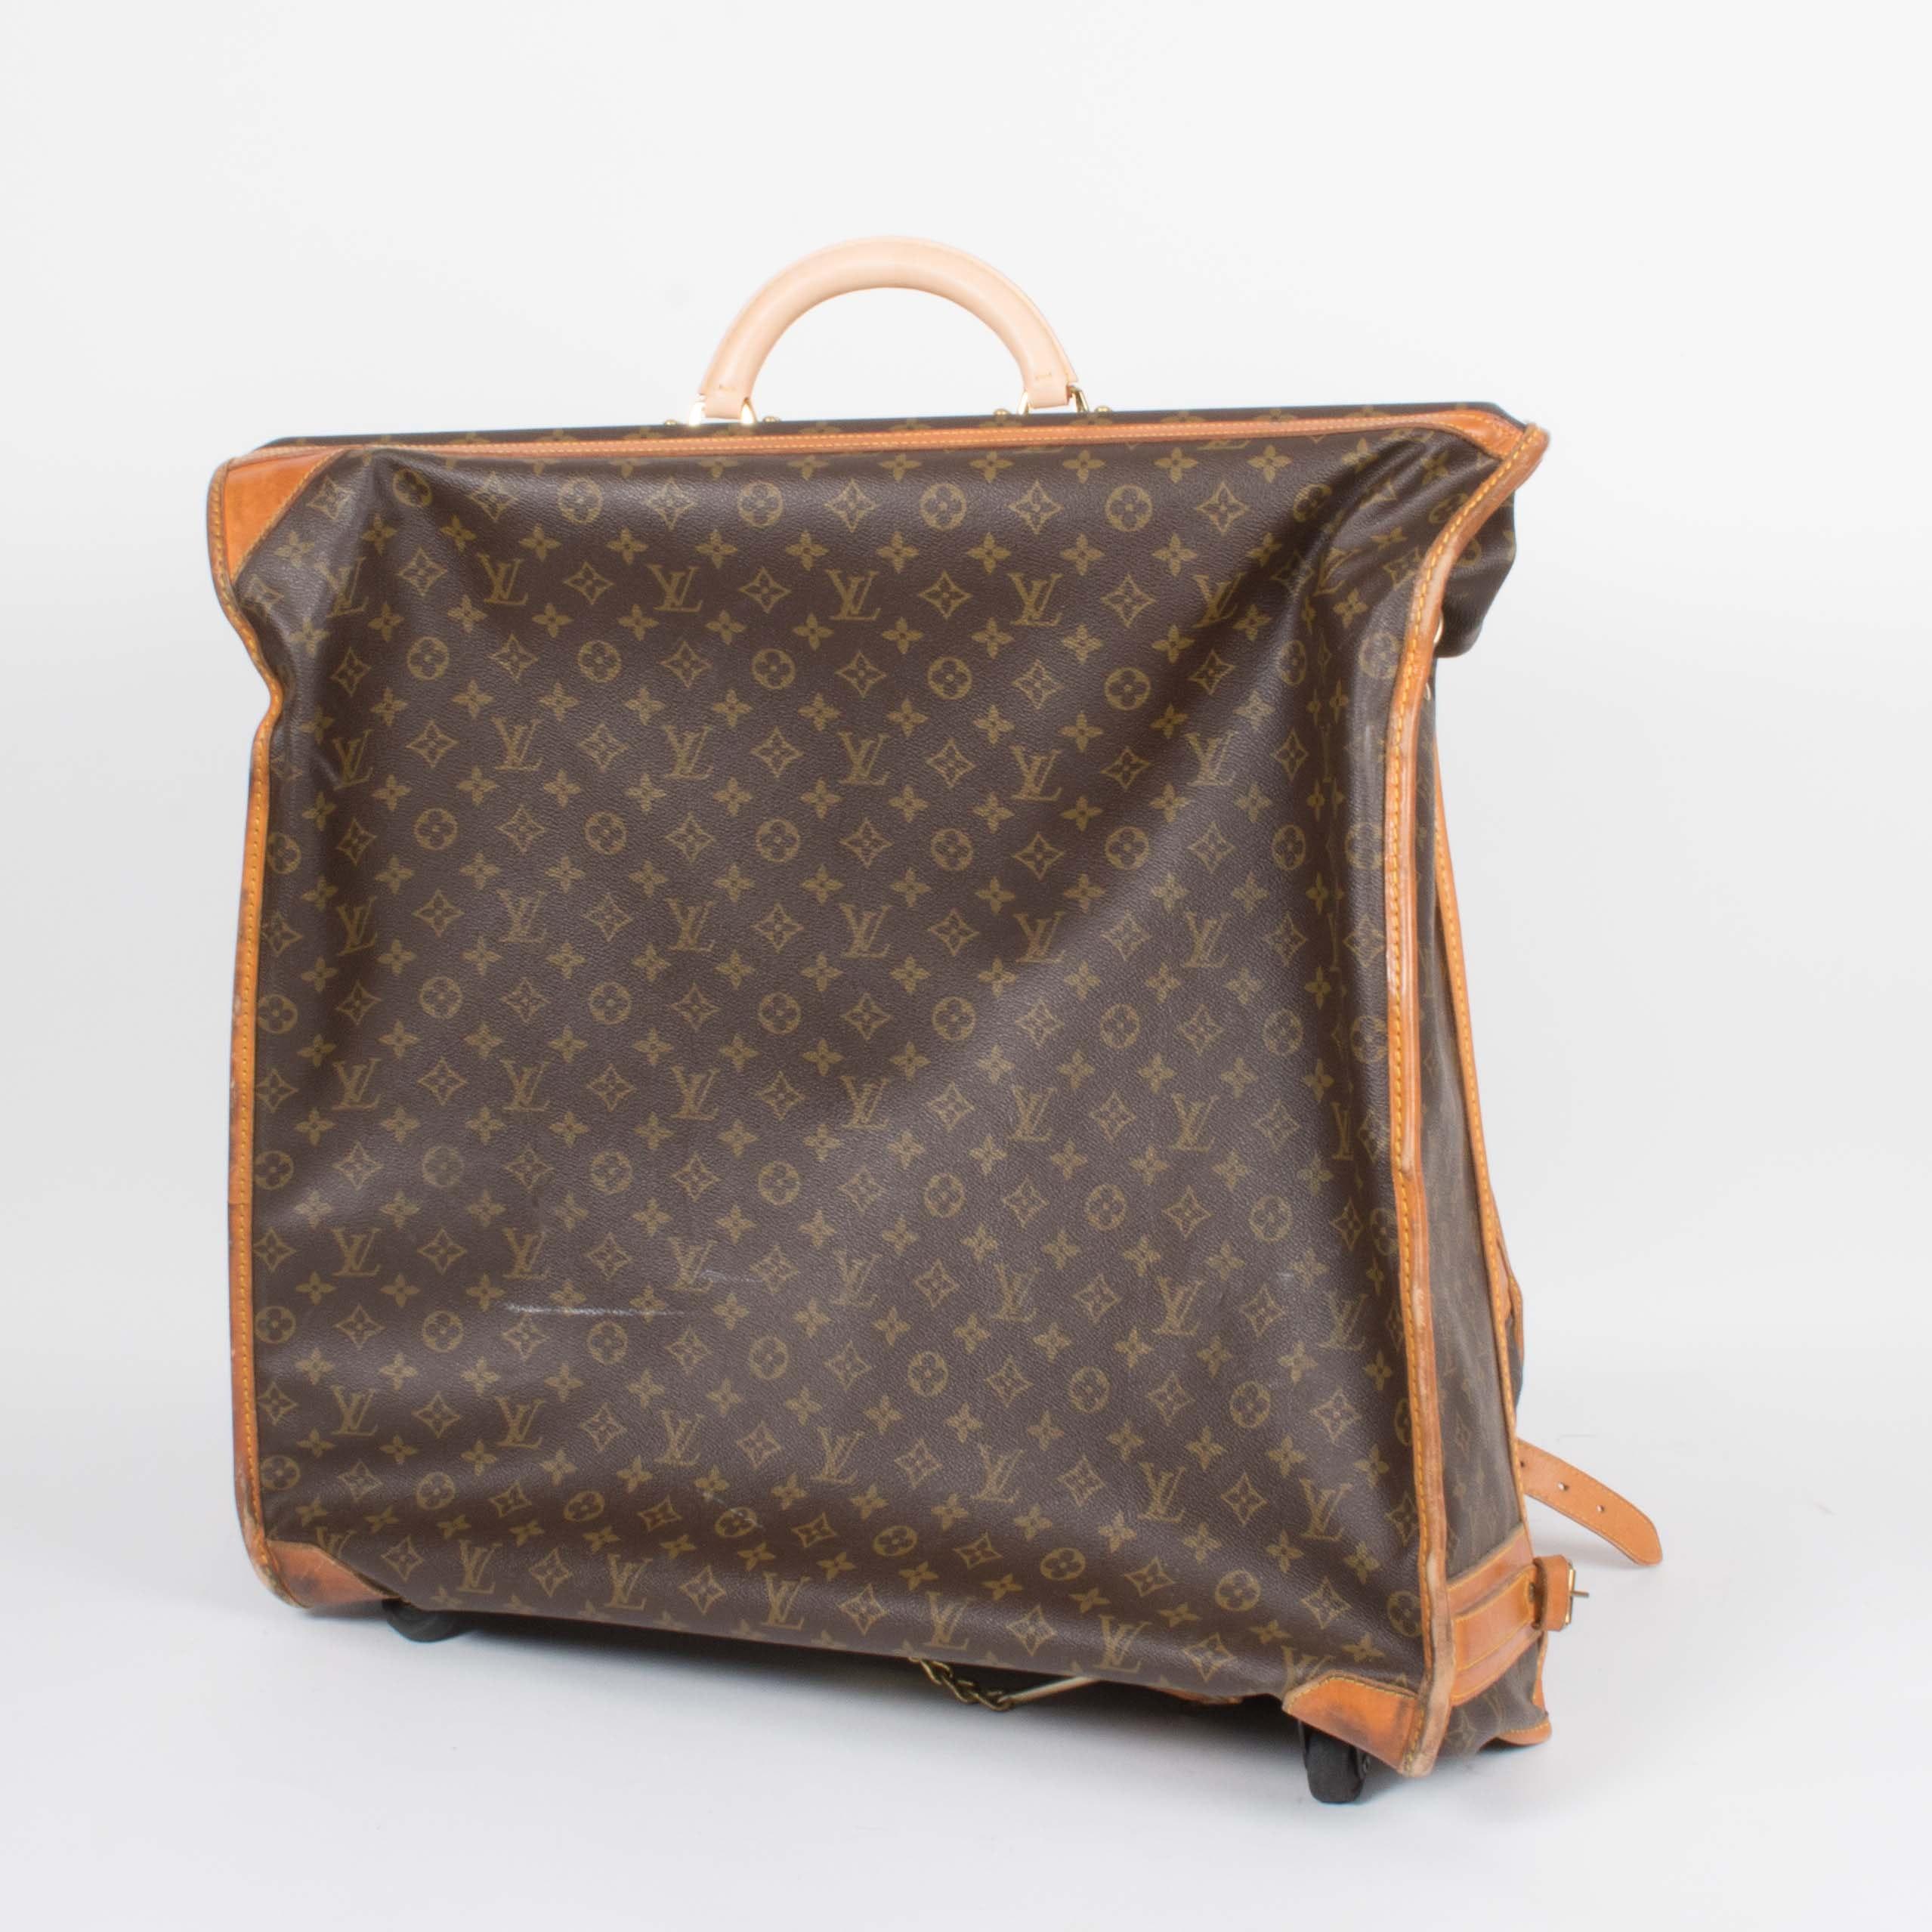 Louis Vuitton Rolling Garment Bag